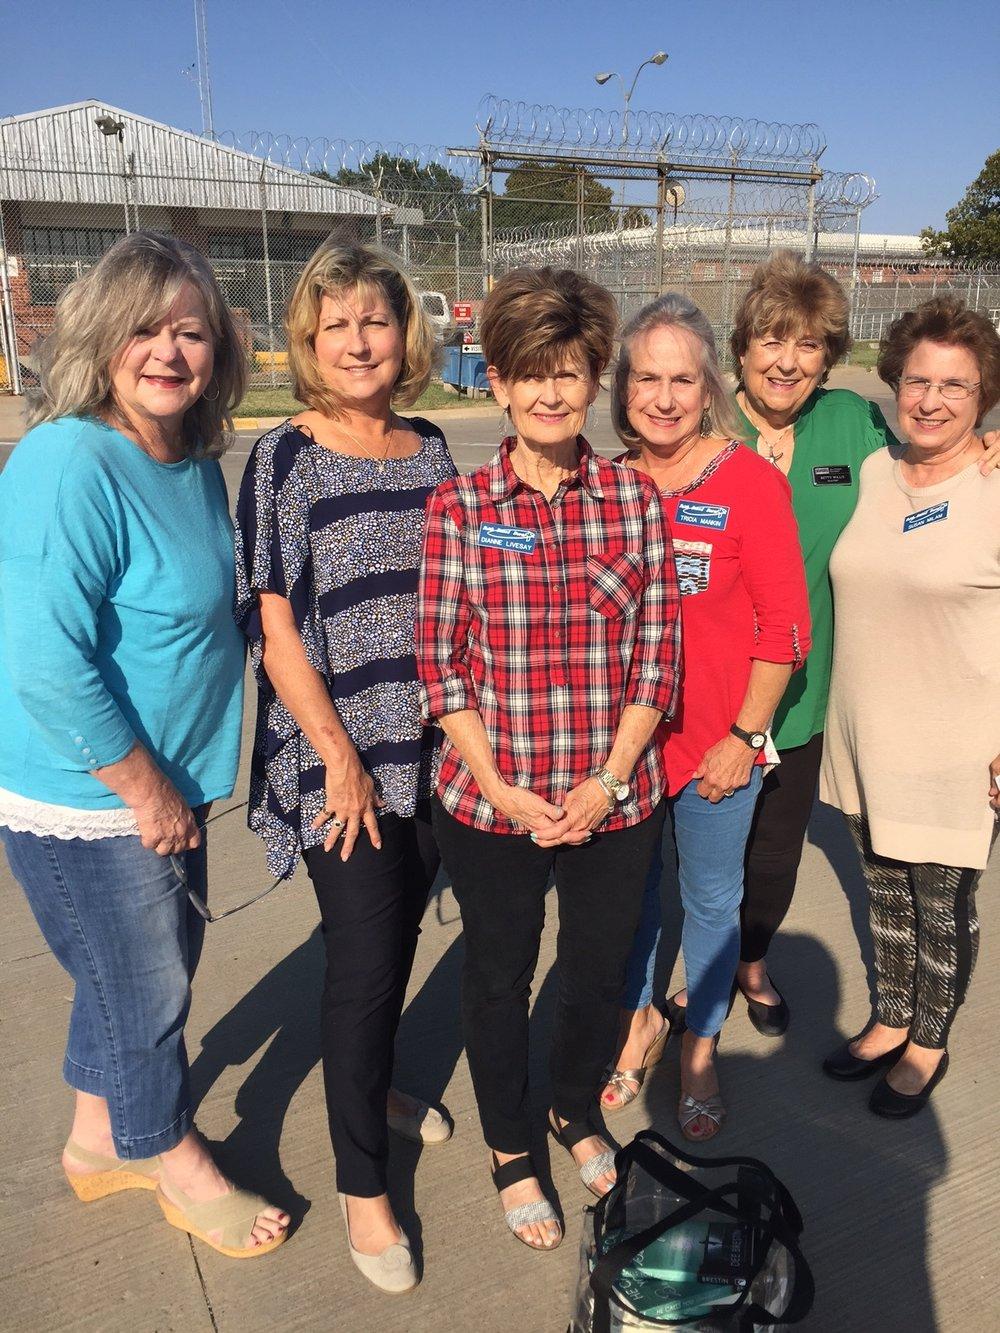 CLARE: Waco women